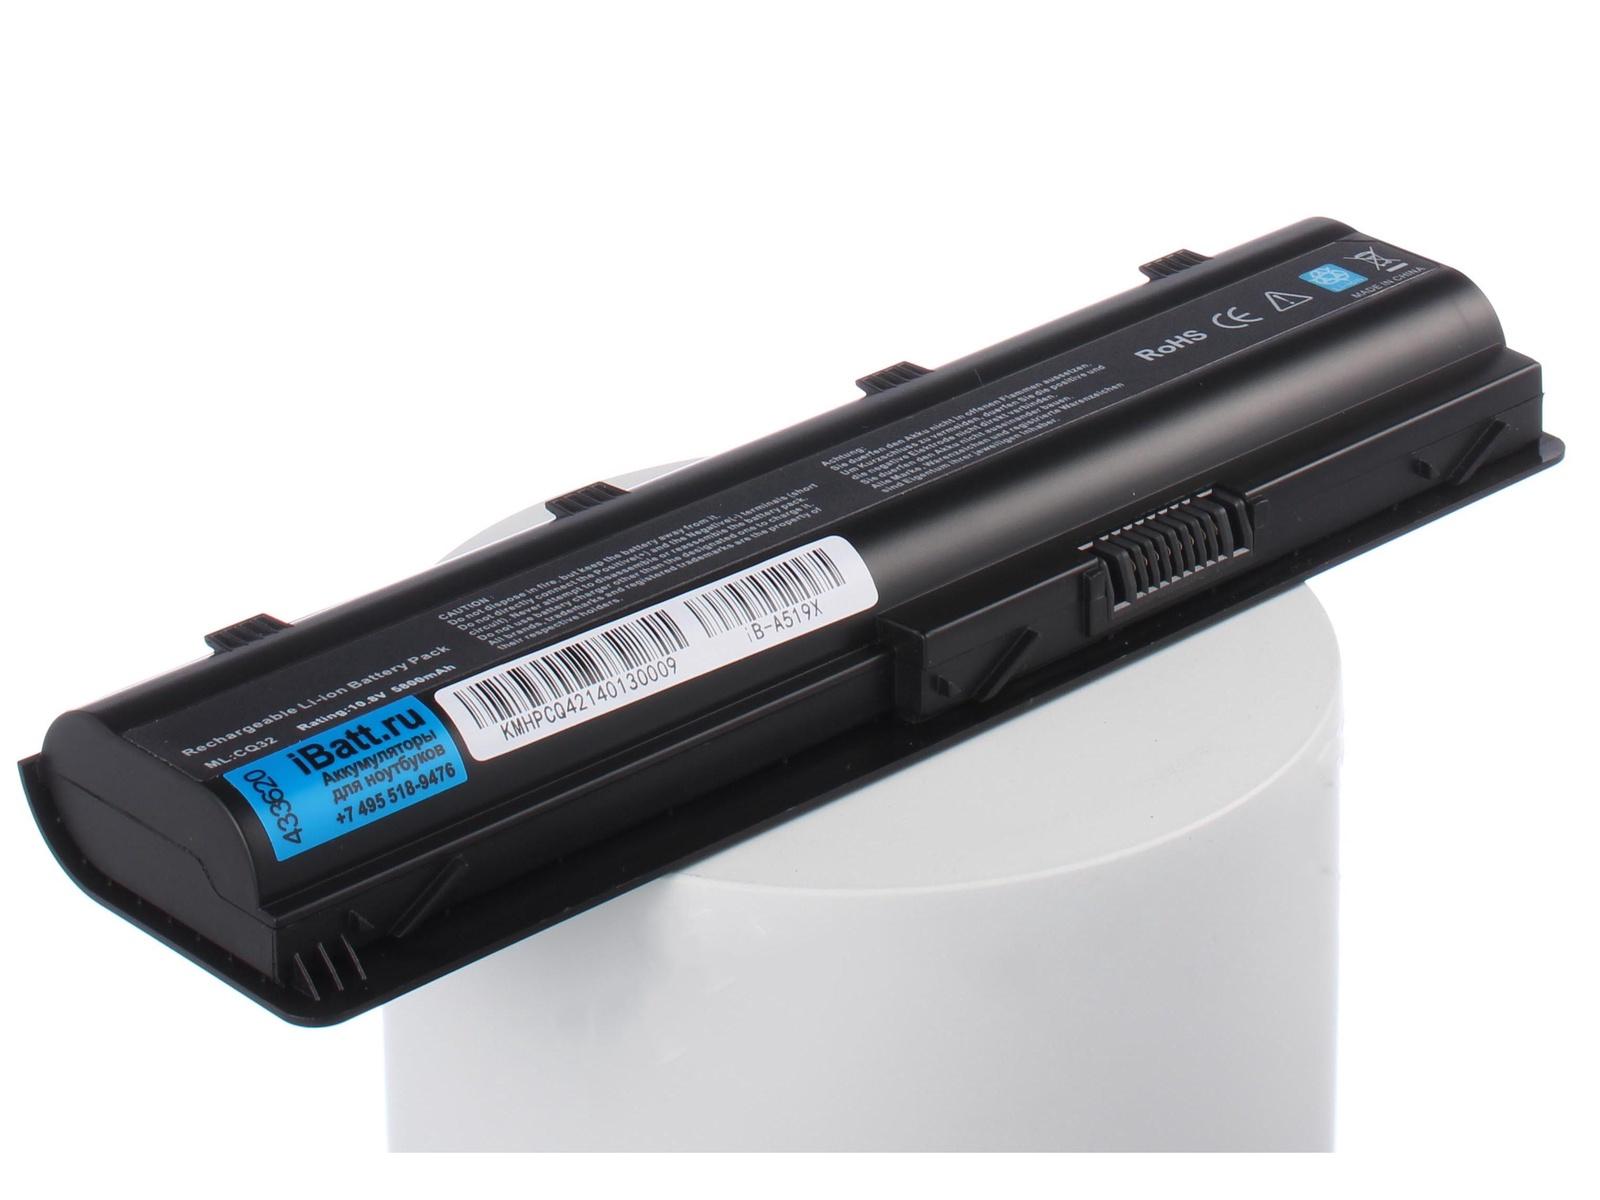 Аккумулятор для ноутбука iBatt для HP-Compaq G62-a60ER, G62-b24ER, Pavilion dv6-3030er, Pavilion dv6-6b04er, Pavilion dv7-4285dx, Pavilion dv7-6b51er, Pavilion g6-2300er, Pavilion g7-2313er, G62-a10ER, Pavilion dv7-4121er хажнин б м и др евангелие от природы